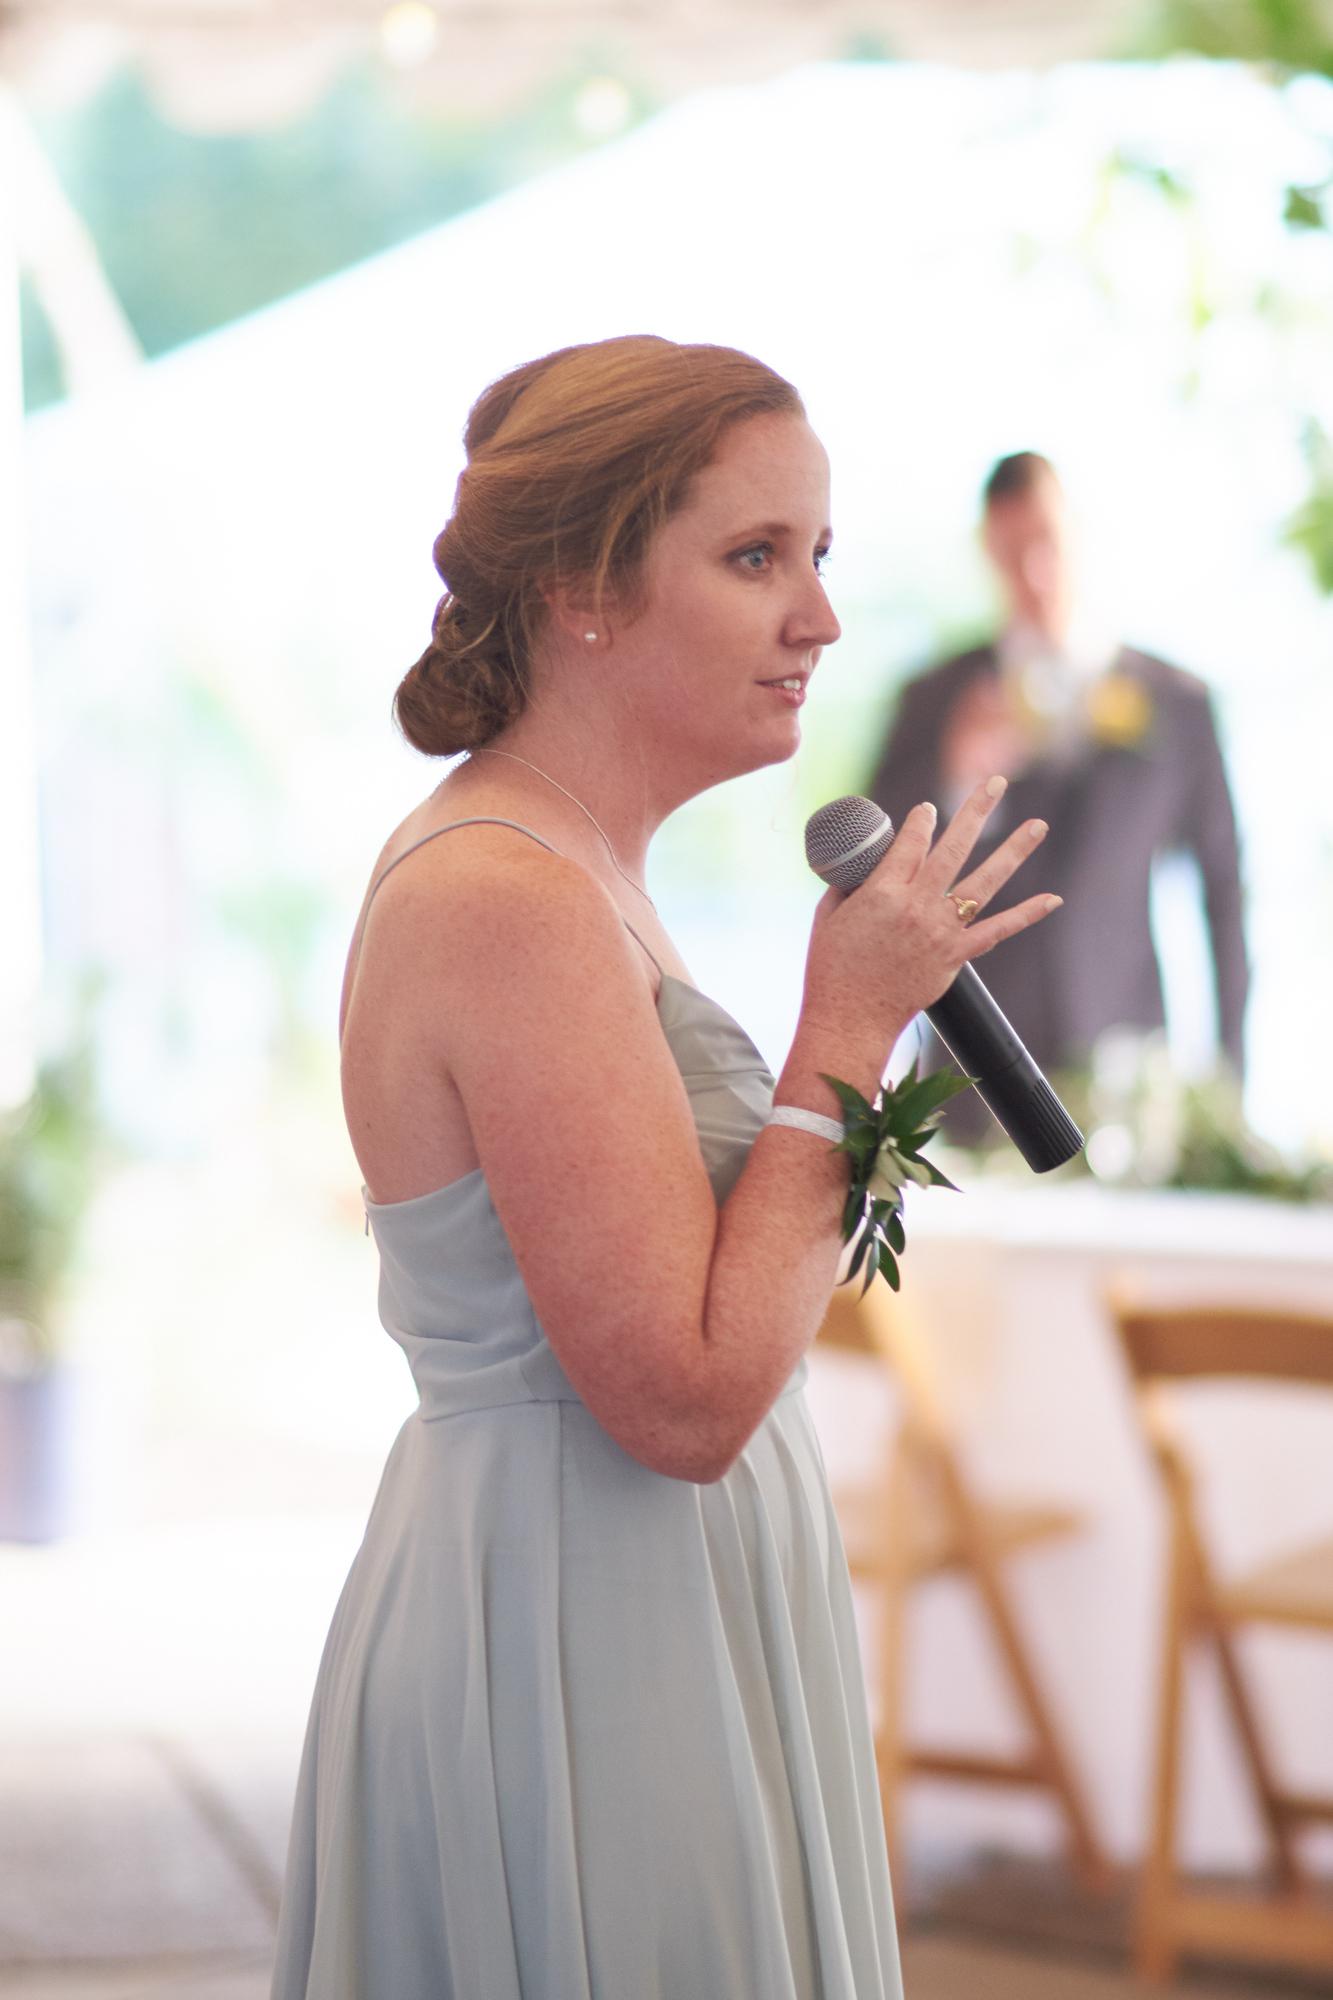 2019-07-20_18-15-57_FUJIFILM_X-T1_(c)_RH_weddingsbyryanandkate.com.JPG